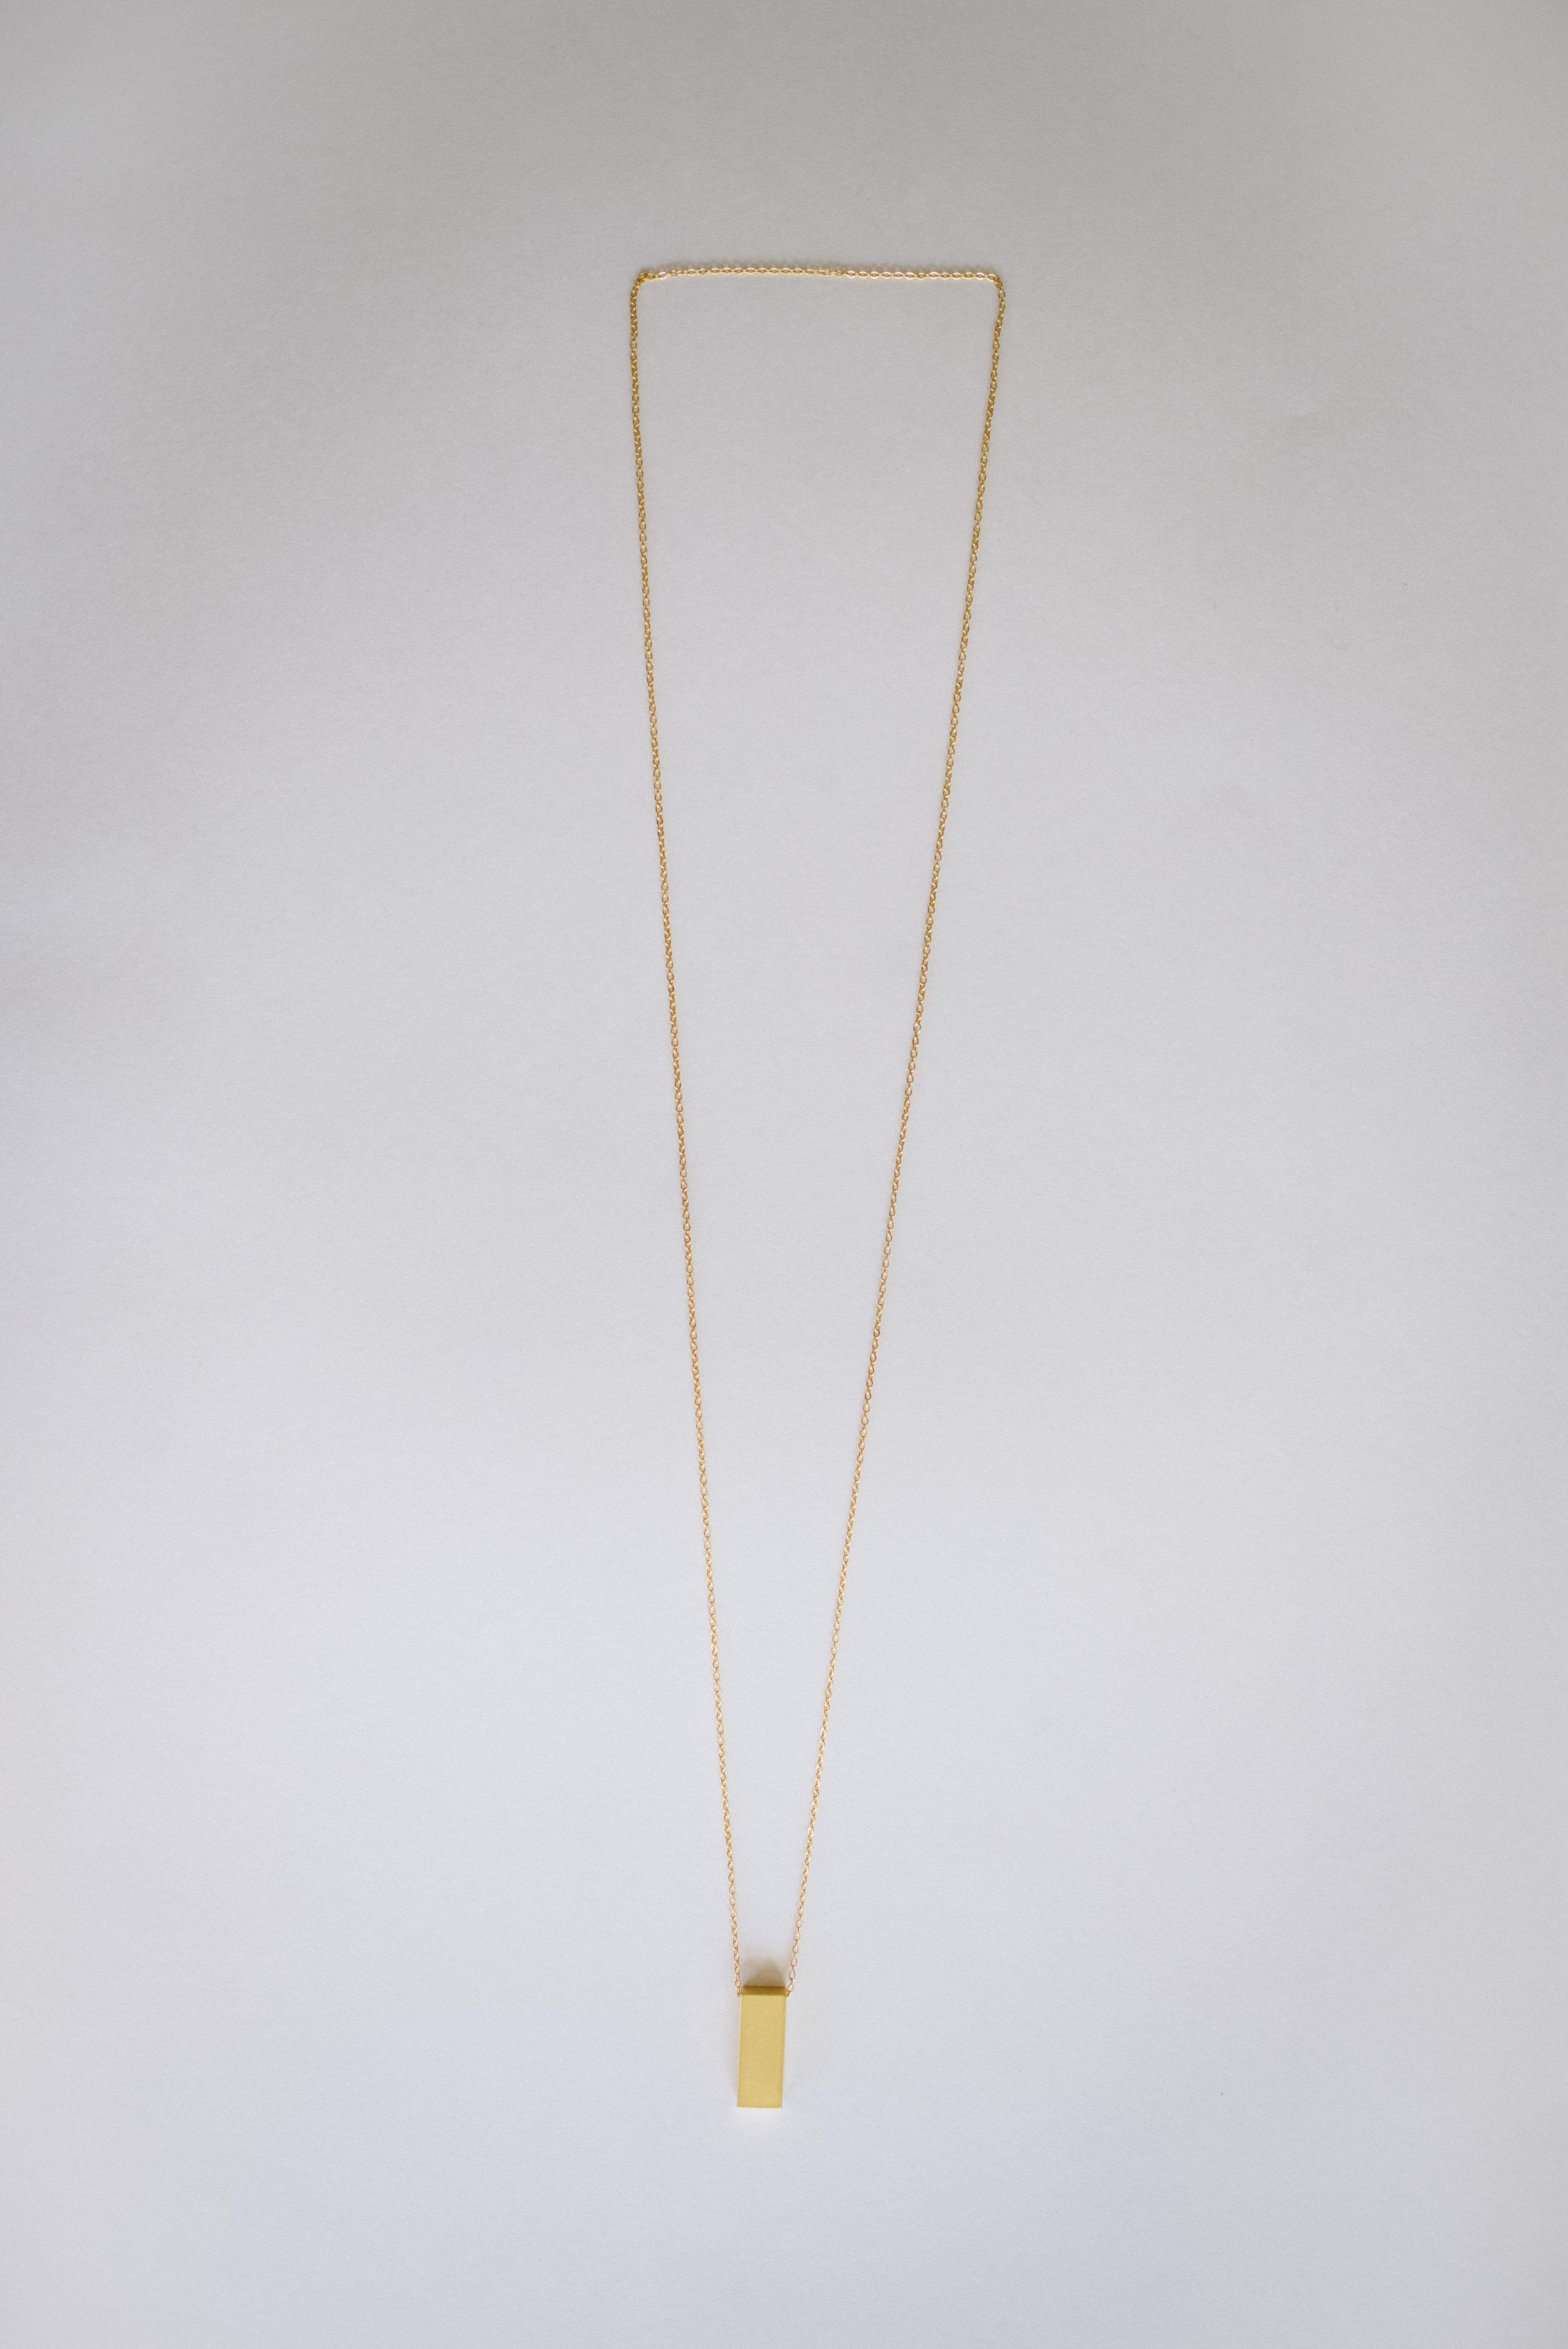 Windblown Jewelry - Creative Profile - Creative Community